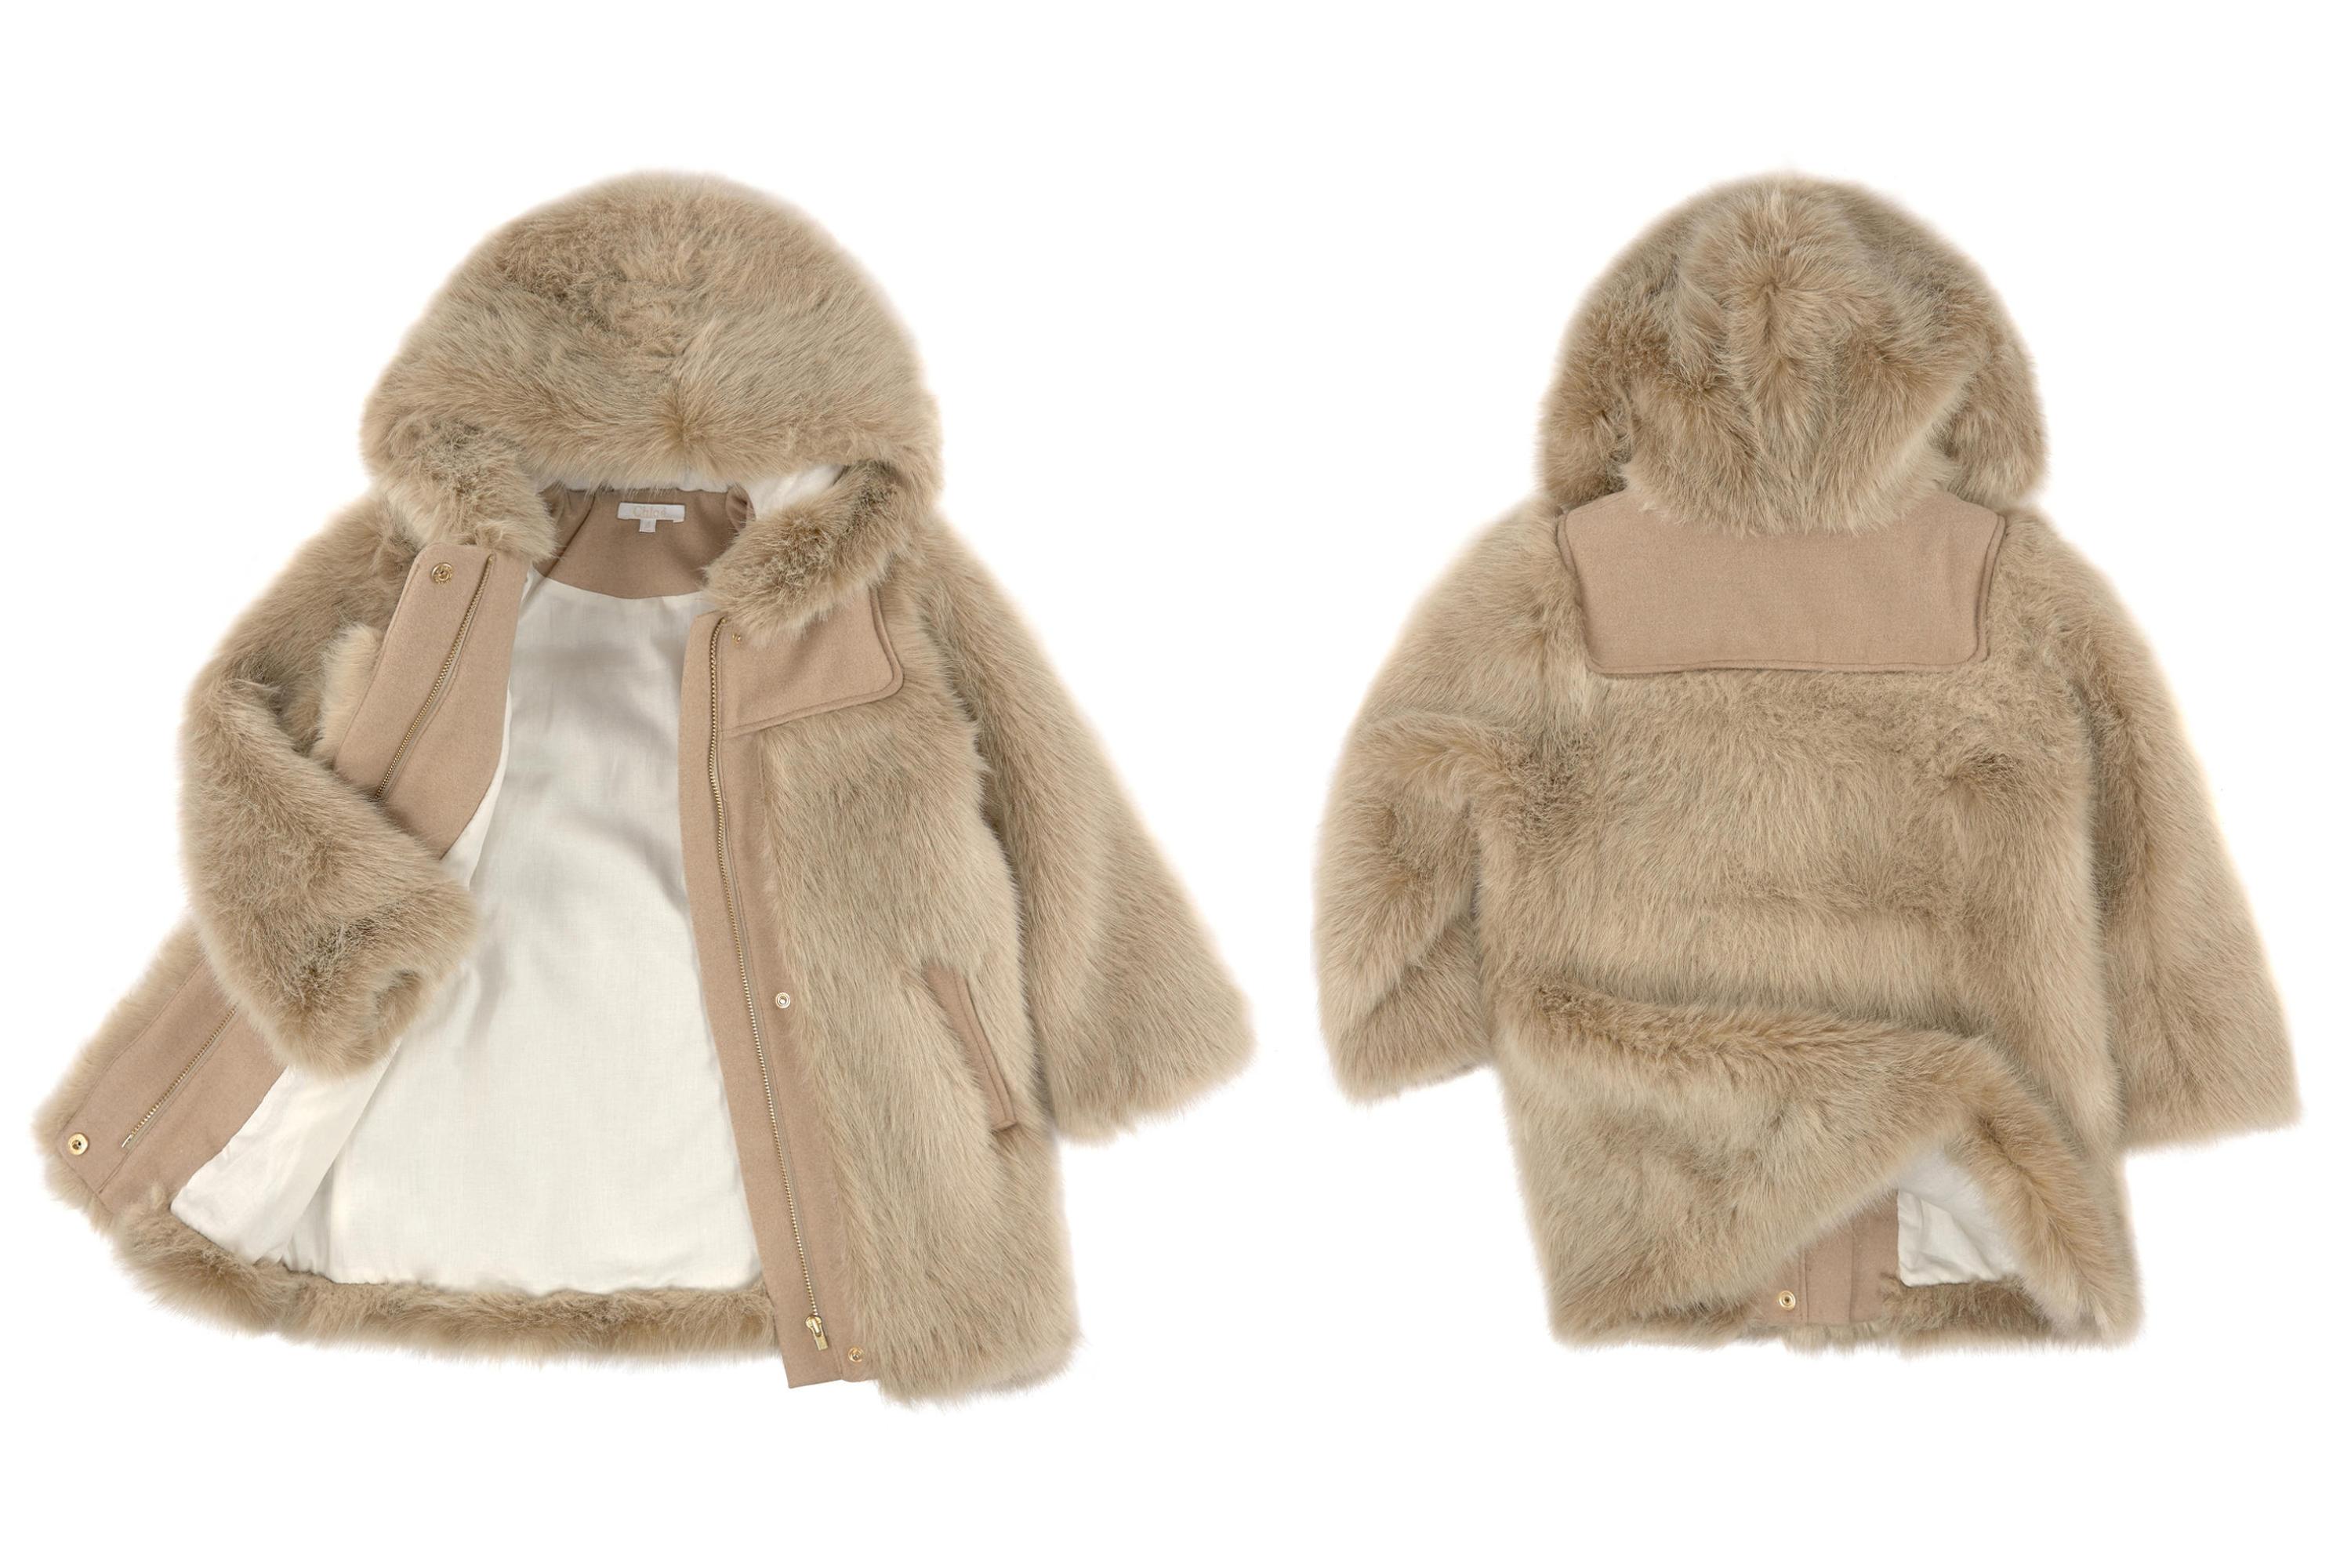 Chloé children's wear winter 2014 syntethic fur coat with hood